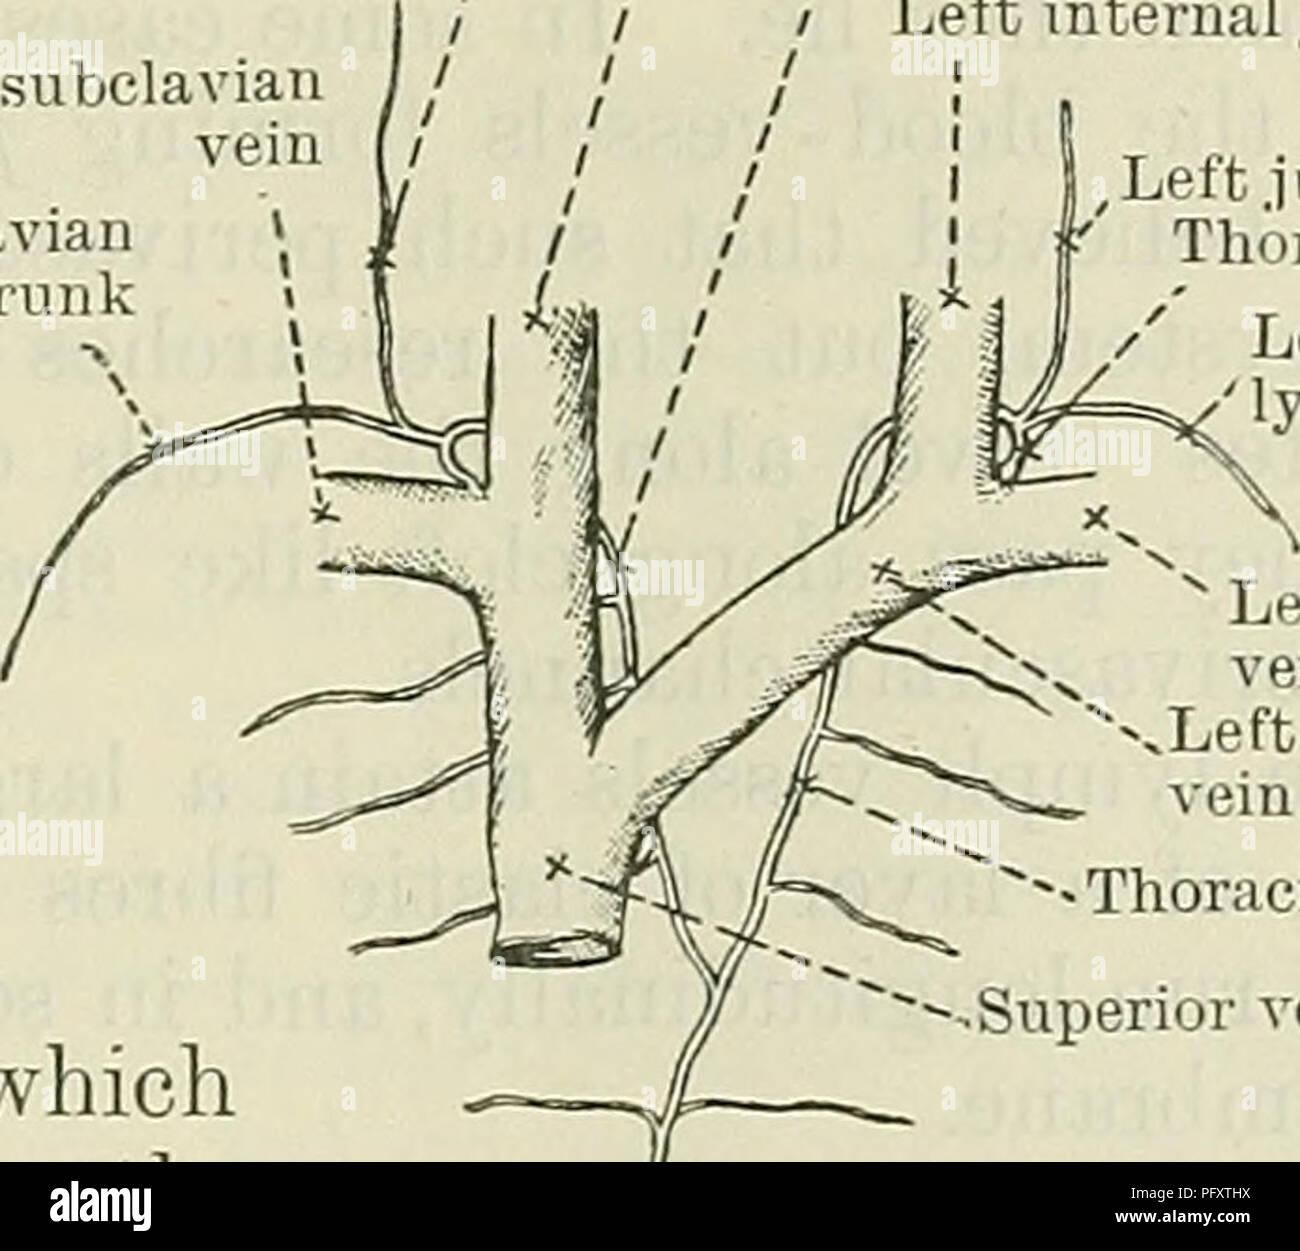 Iliac Artery Imágenes De Stock & Iliac Artery Fotos De Stock - Alamy